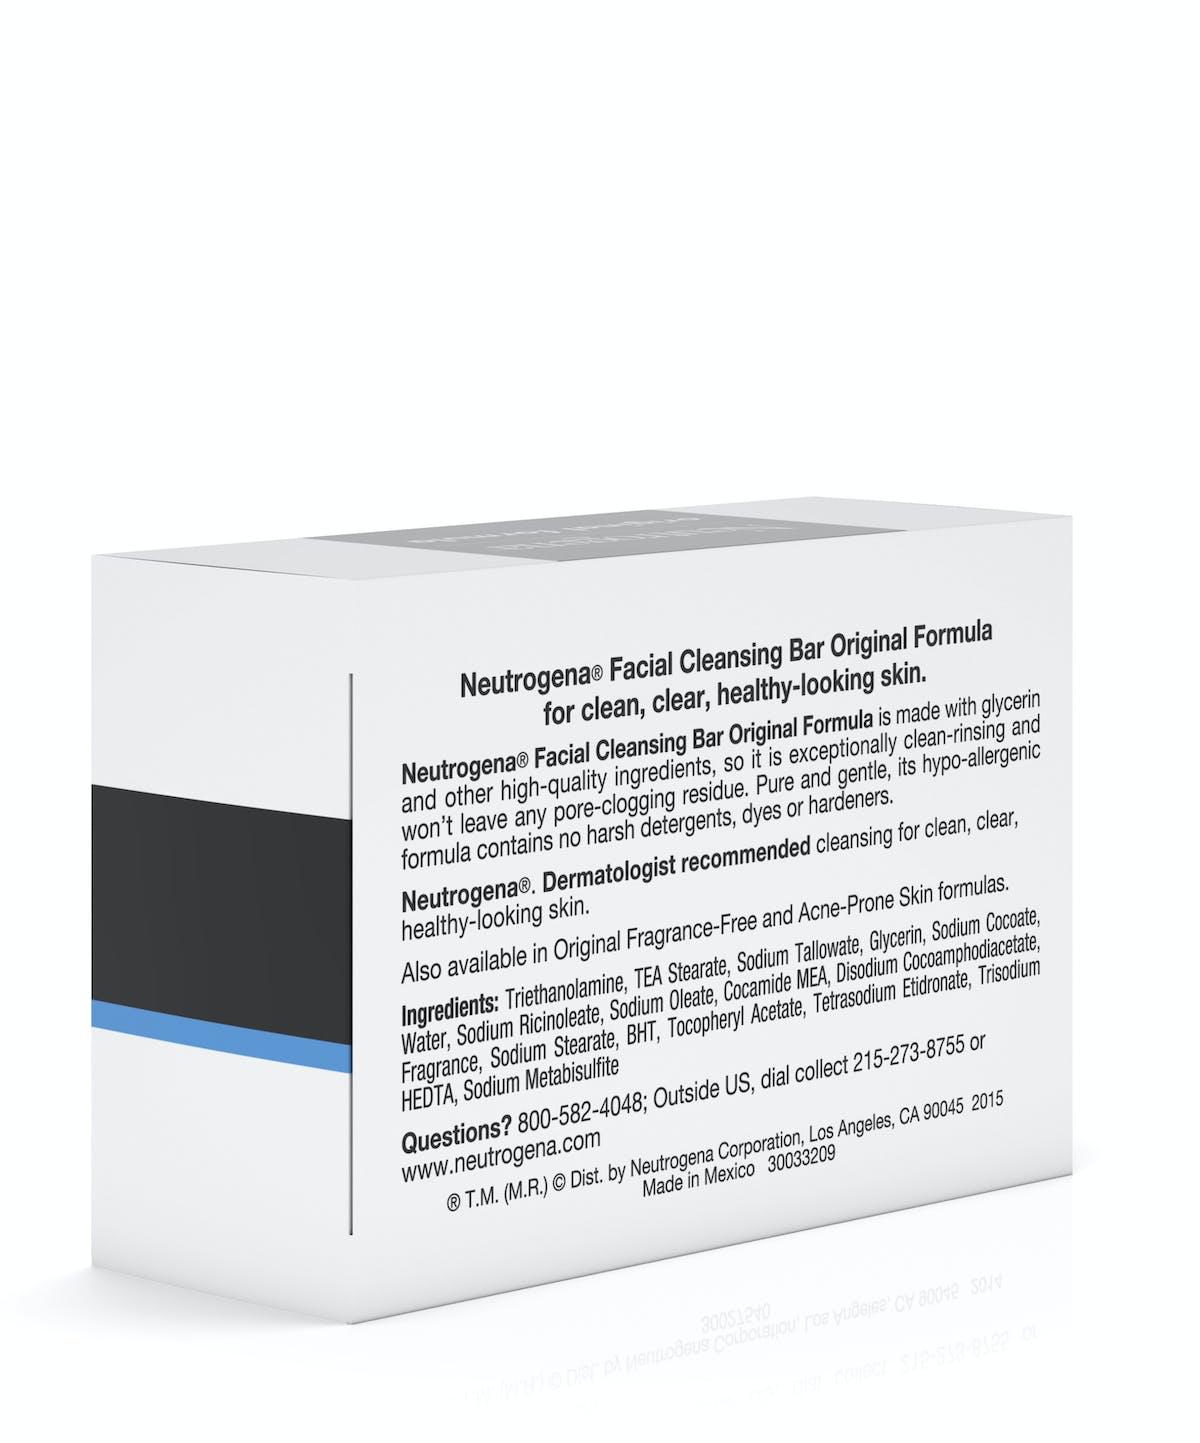 Facial Cleansing Bar Neutrogena Cleanser Original